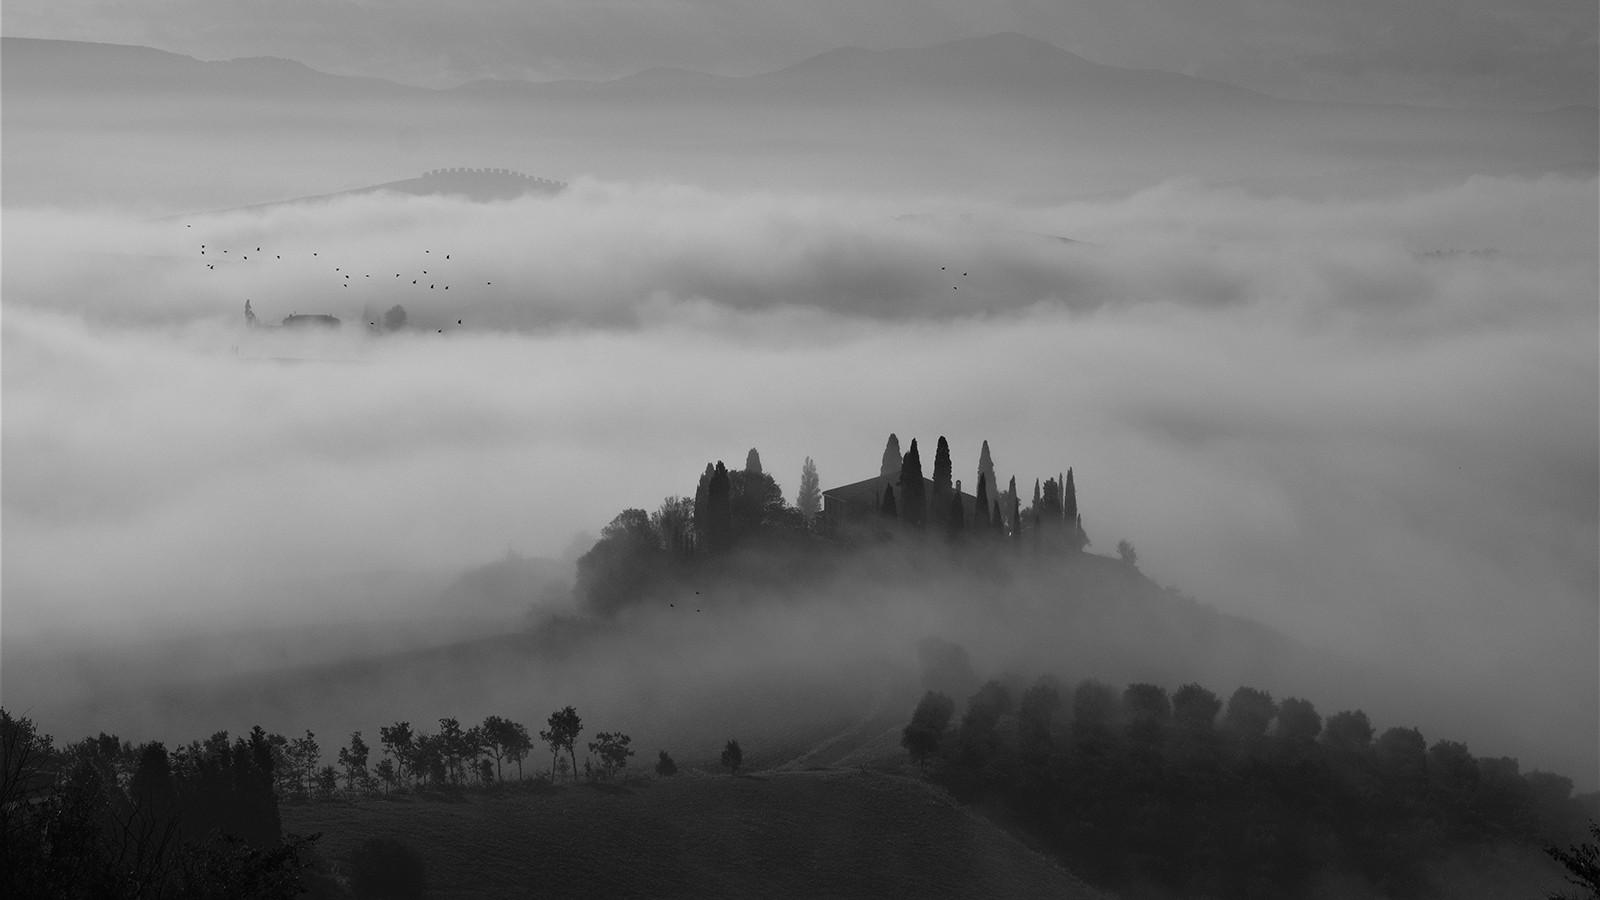 MONO - Misty Morning by Margaret Goodall (10 marks)